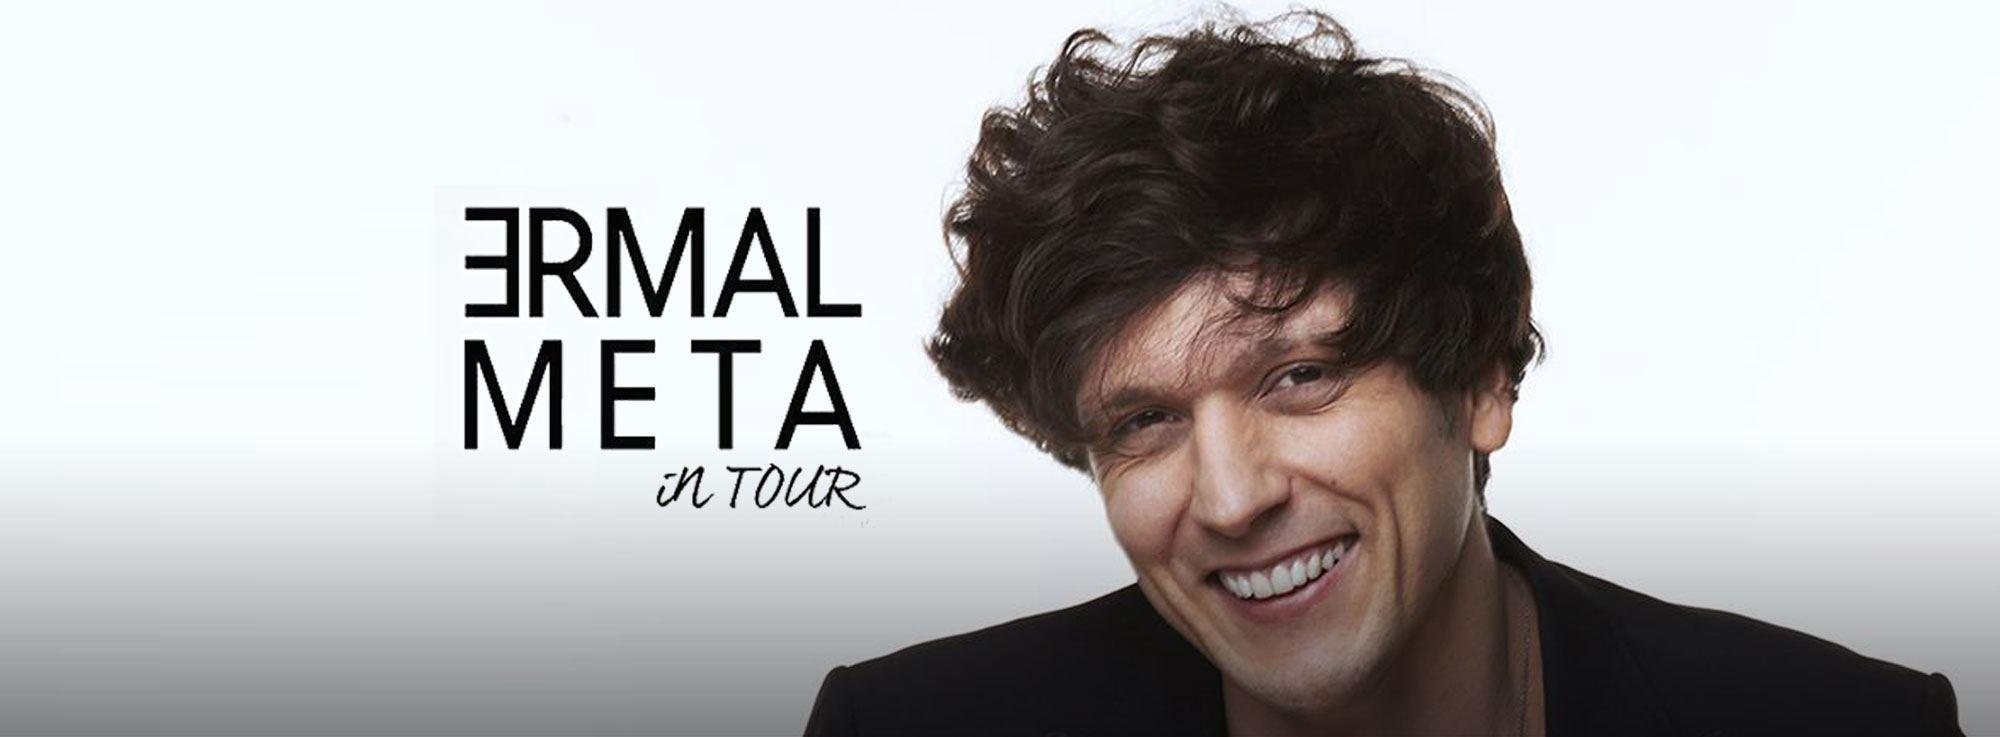 Carovigno: Ermal Meta - Vietato Morire tour